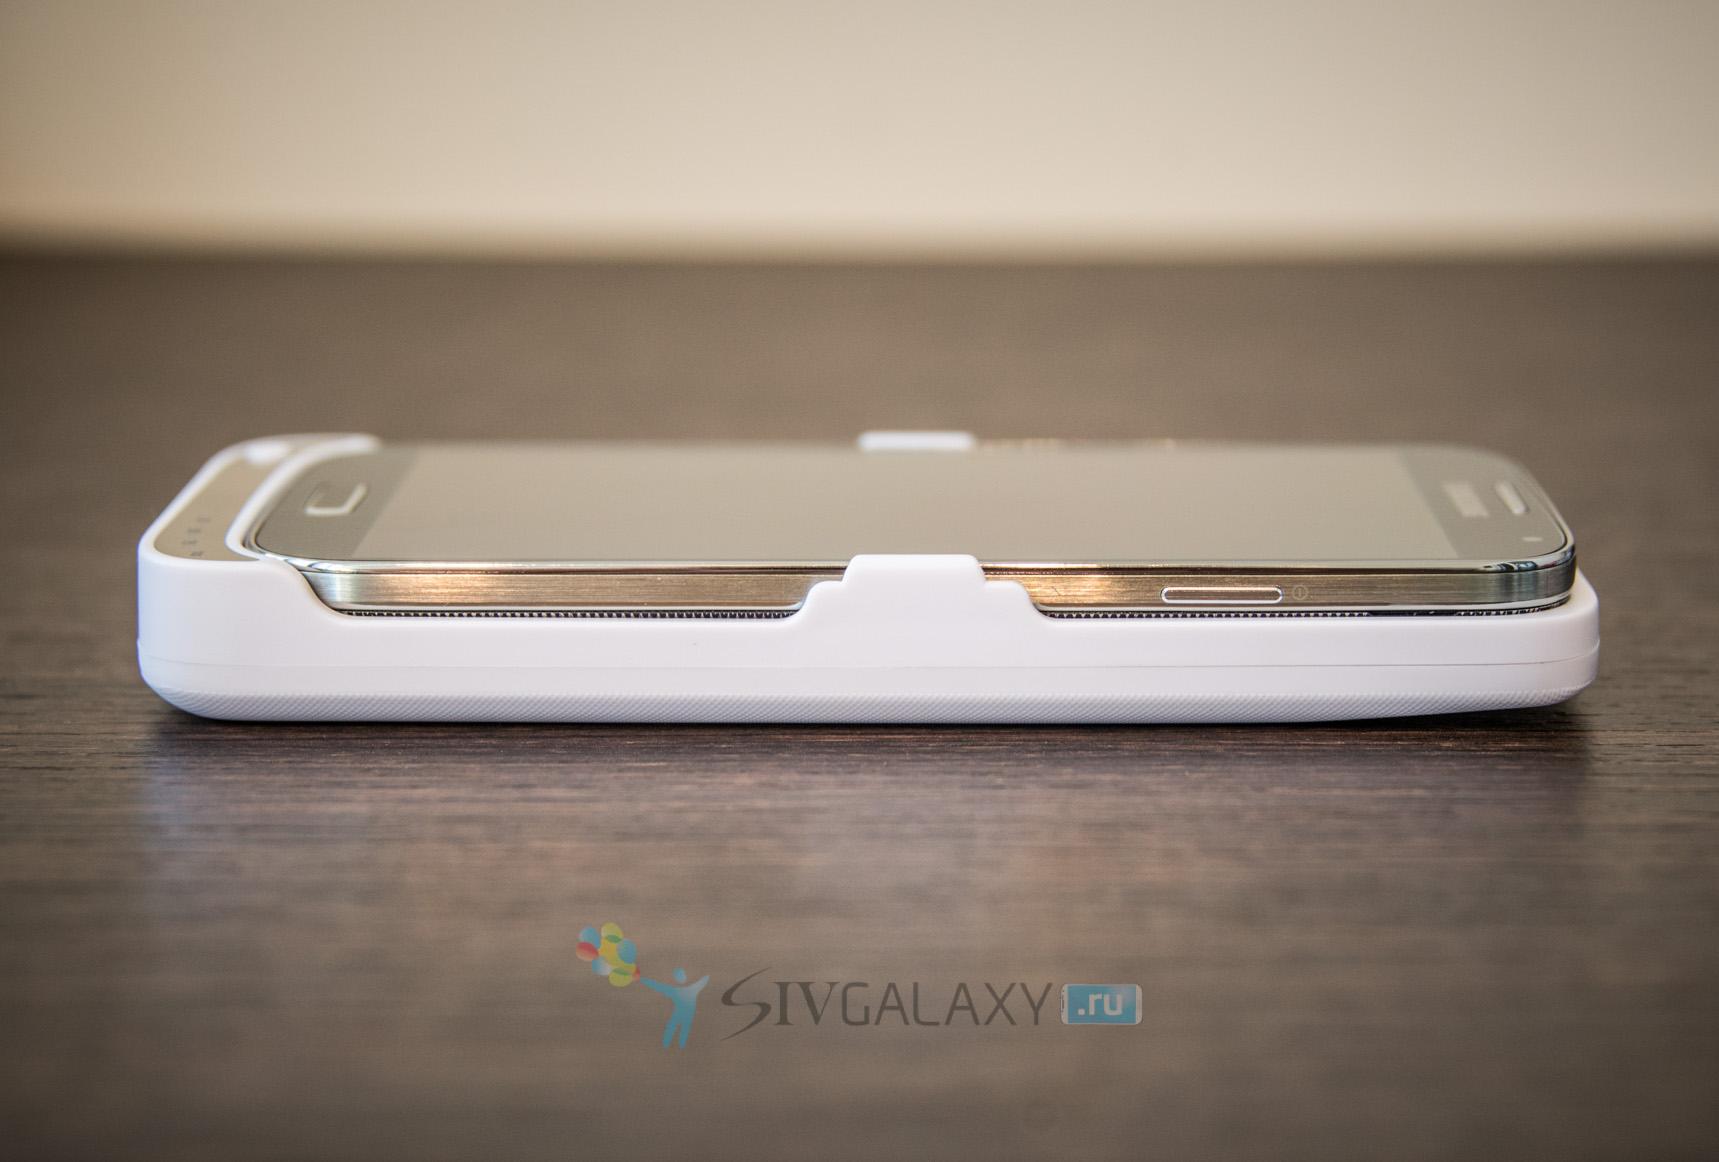 Кейс с аккумулятором для Samsung Galaxy S4 - правая грань